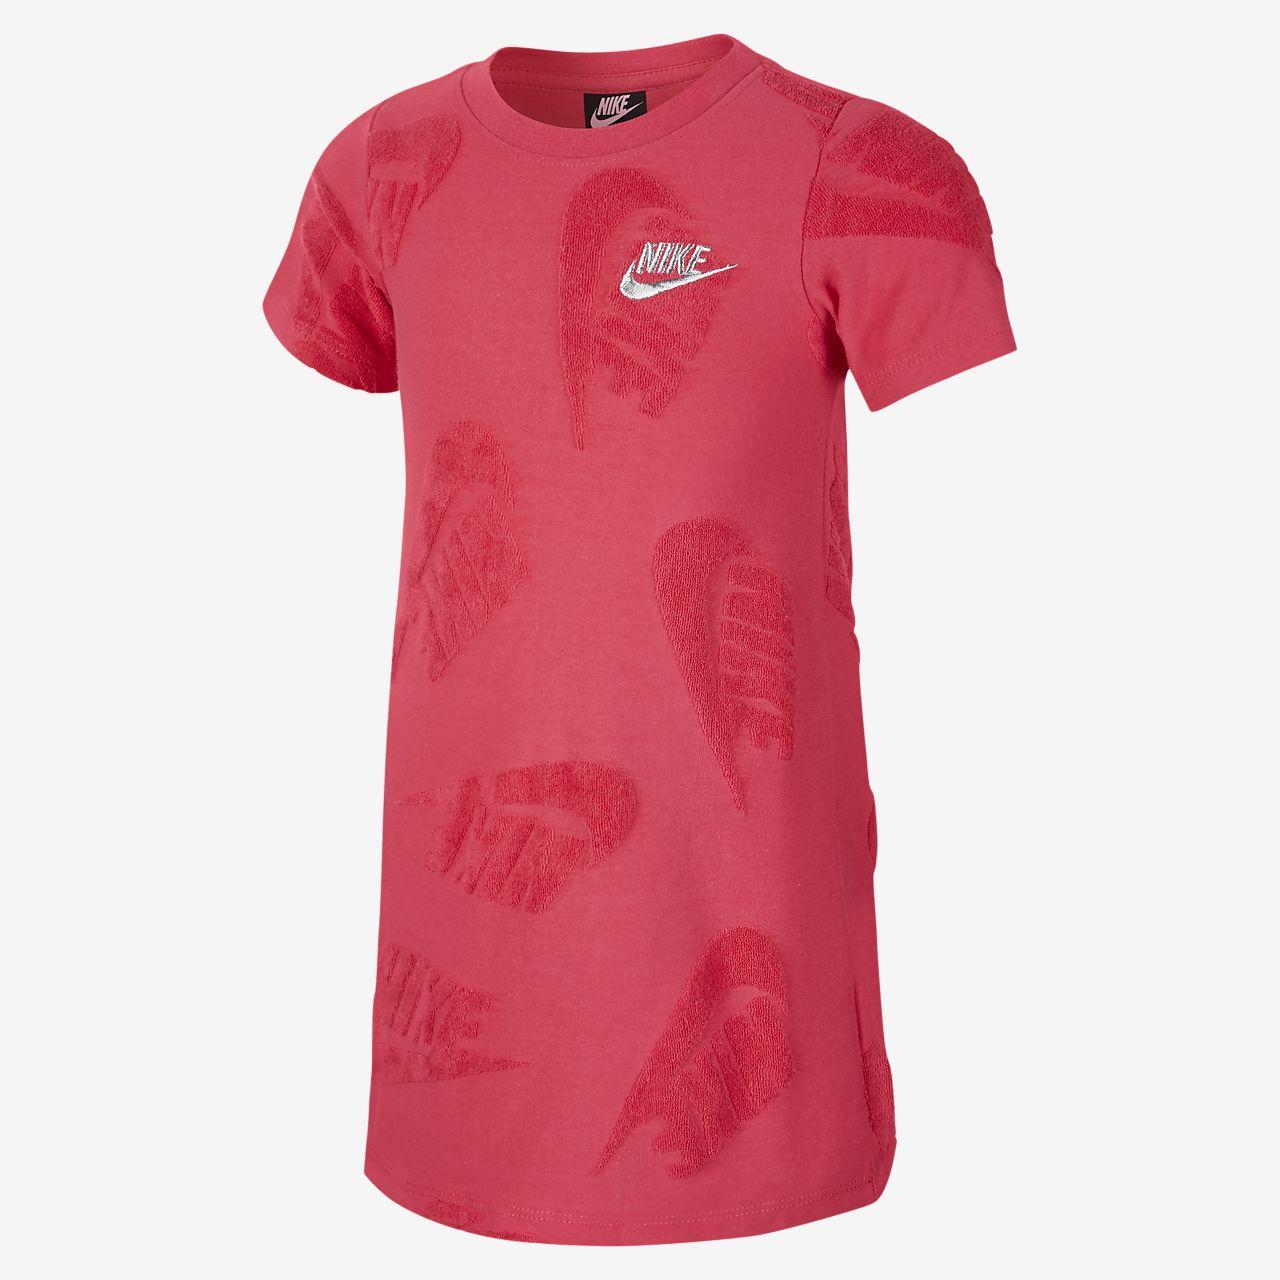 Nike Sportswear 幼童短袖连衣裙